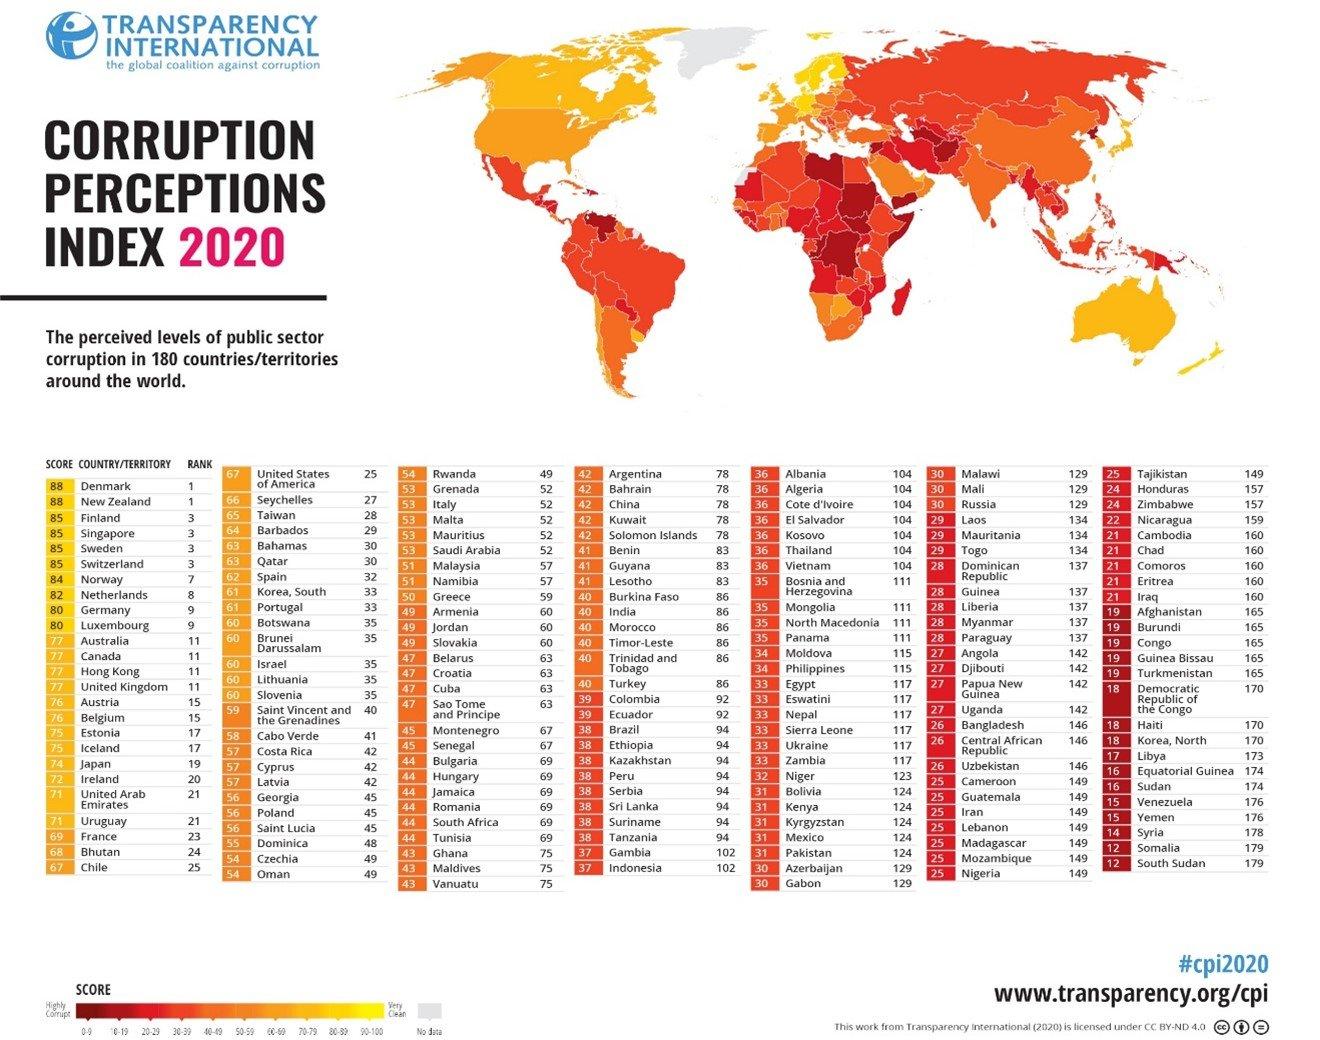 Corruption & Sustainable Development